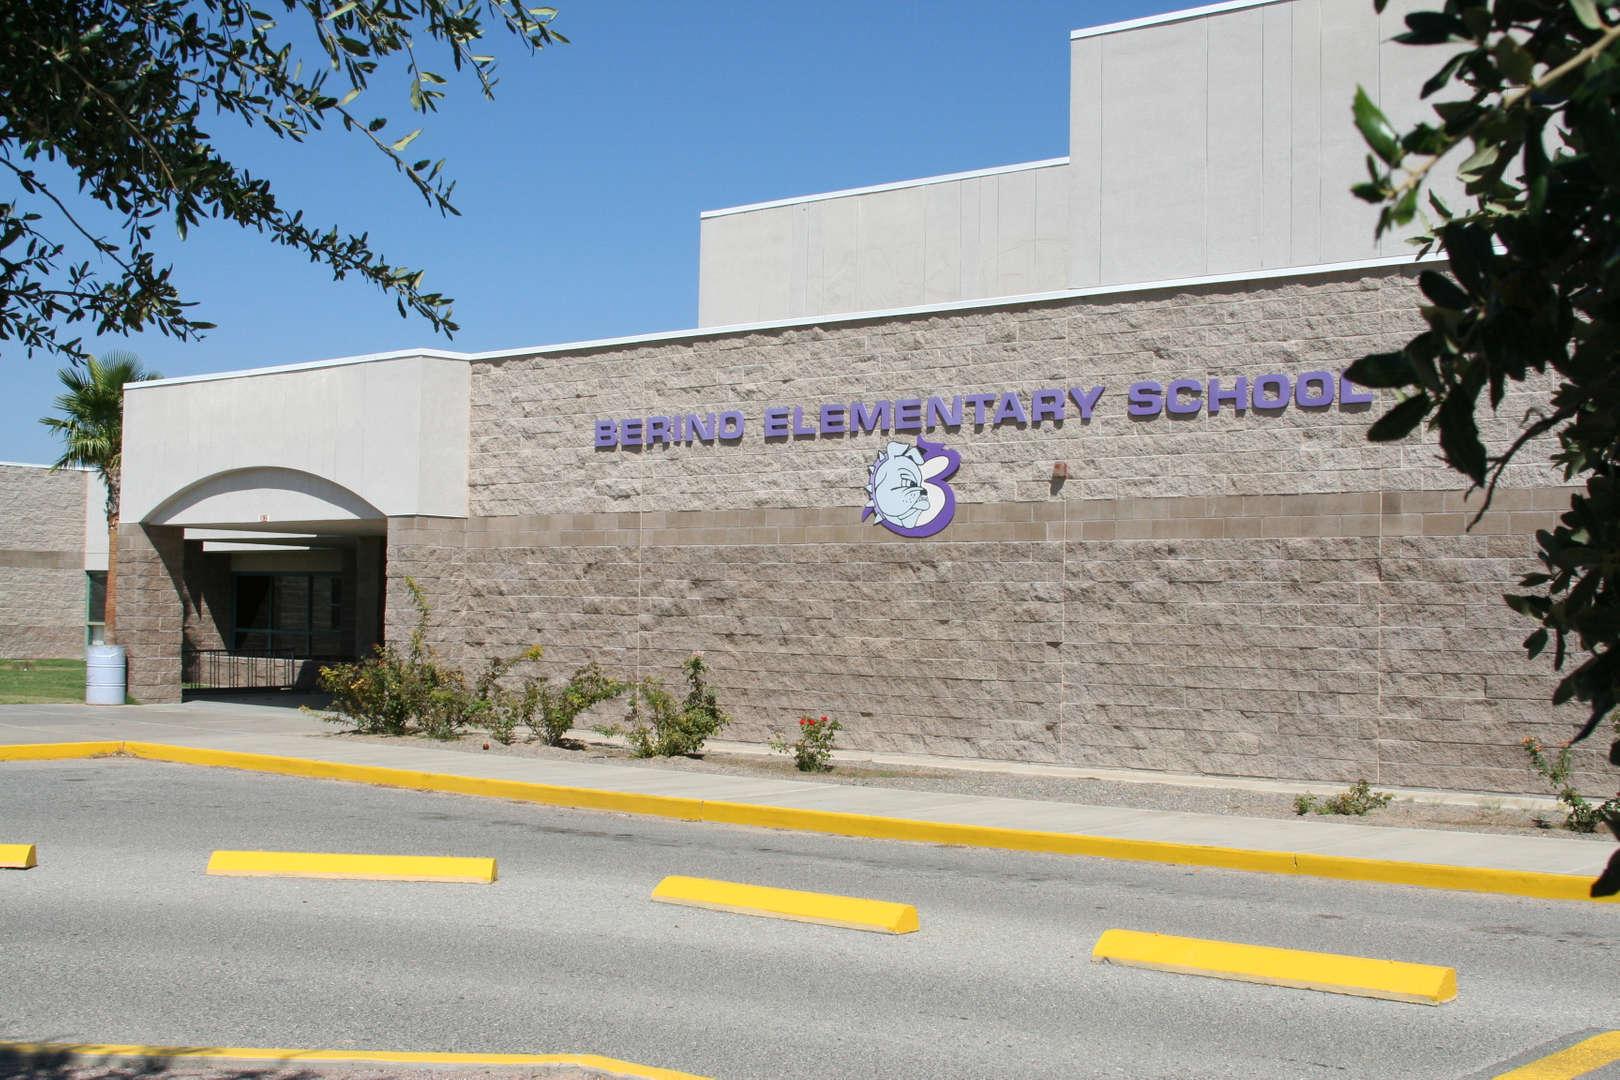 berino's front facade